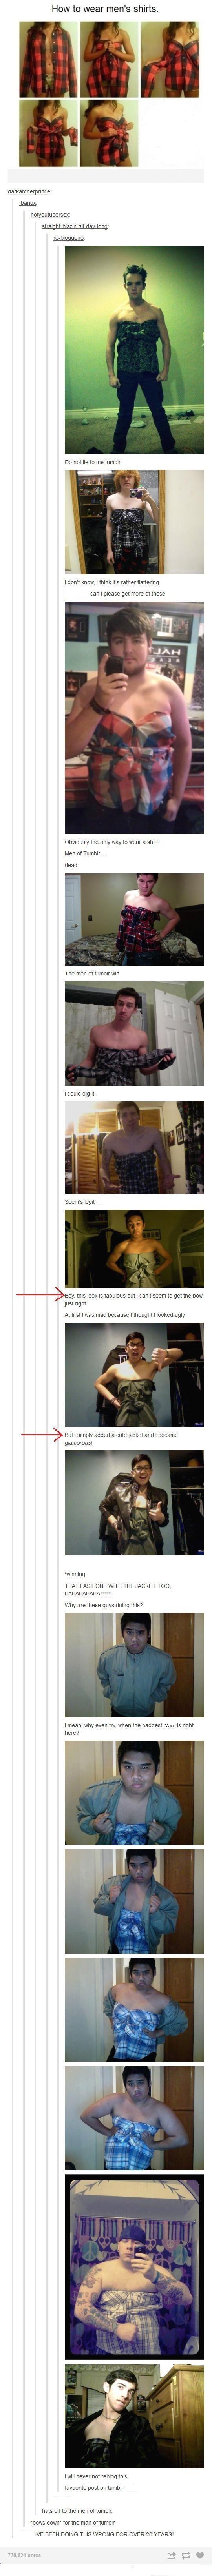 Tumblr guys